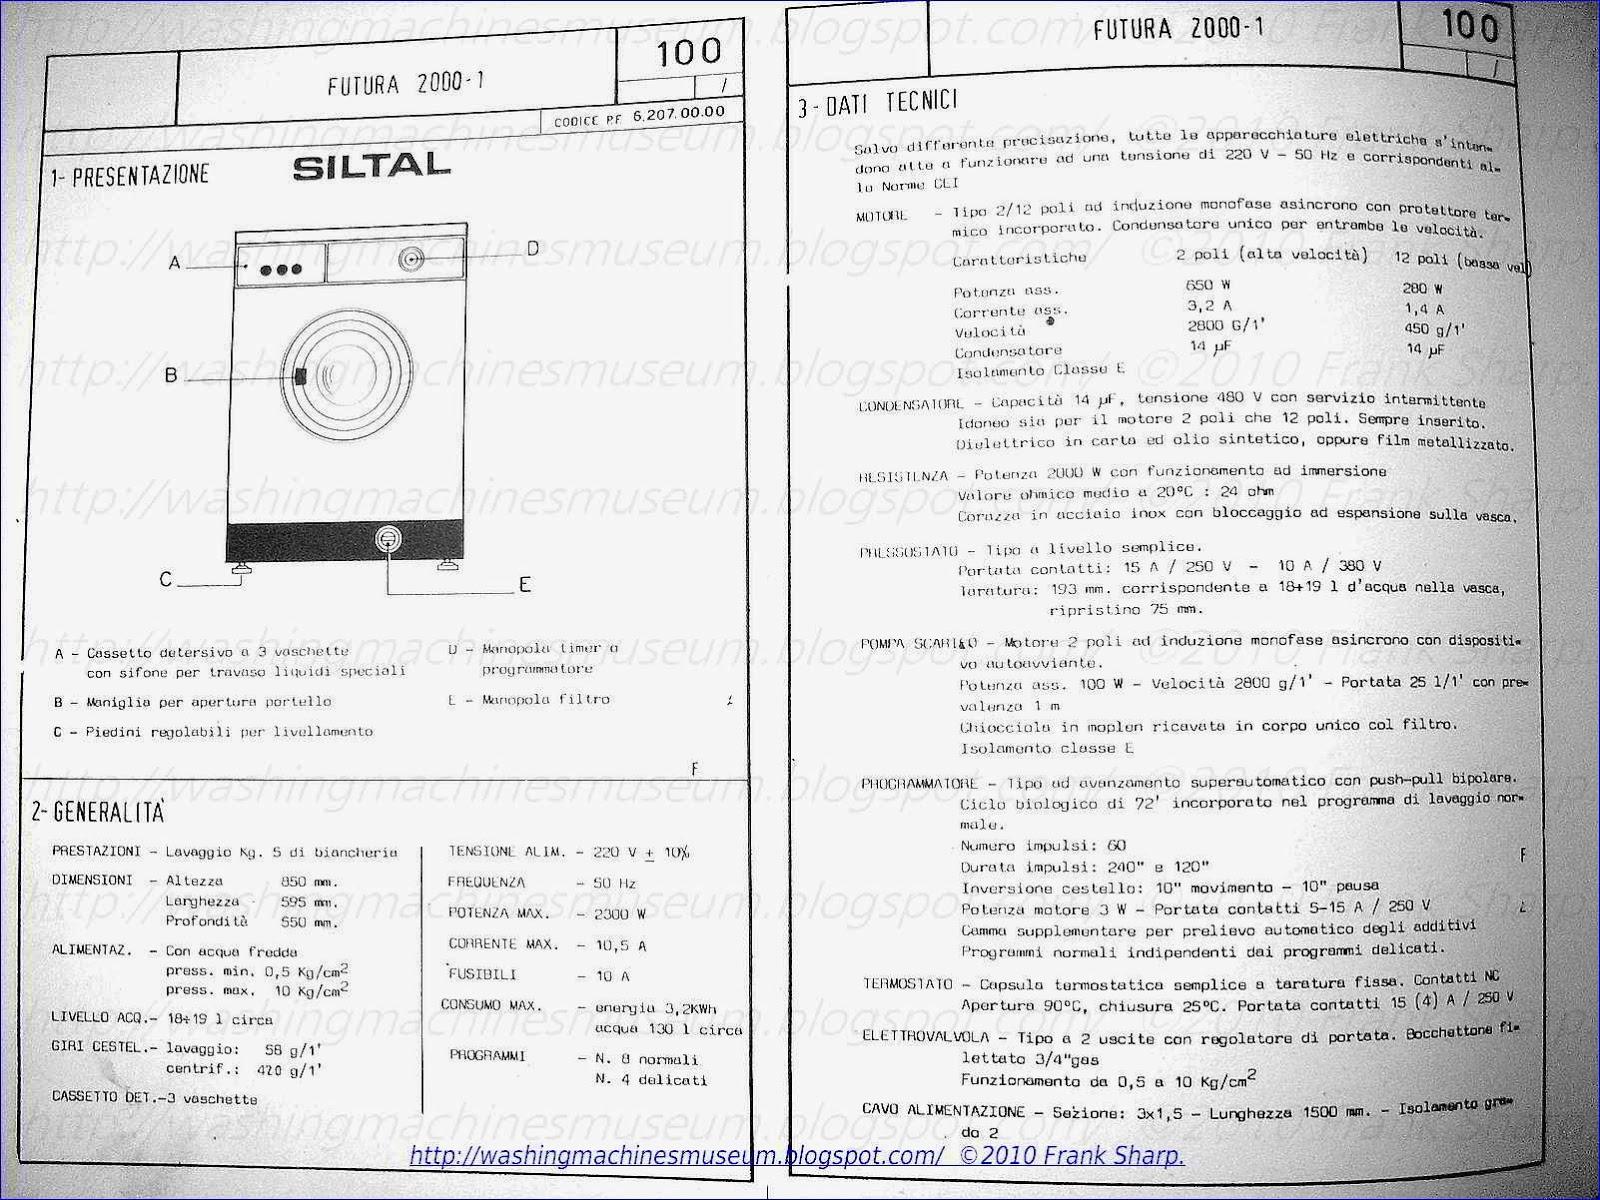 candy washing machine with timer 23255 23256 schematic diagramhome · candy washing machine with timer 23255 23256 schematic diagram · washer rama museum siltal futura 2000 1 2000 2 2000 3